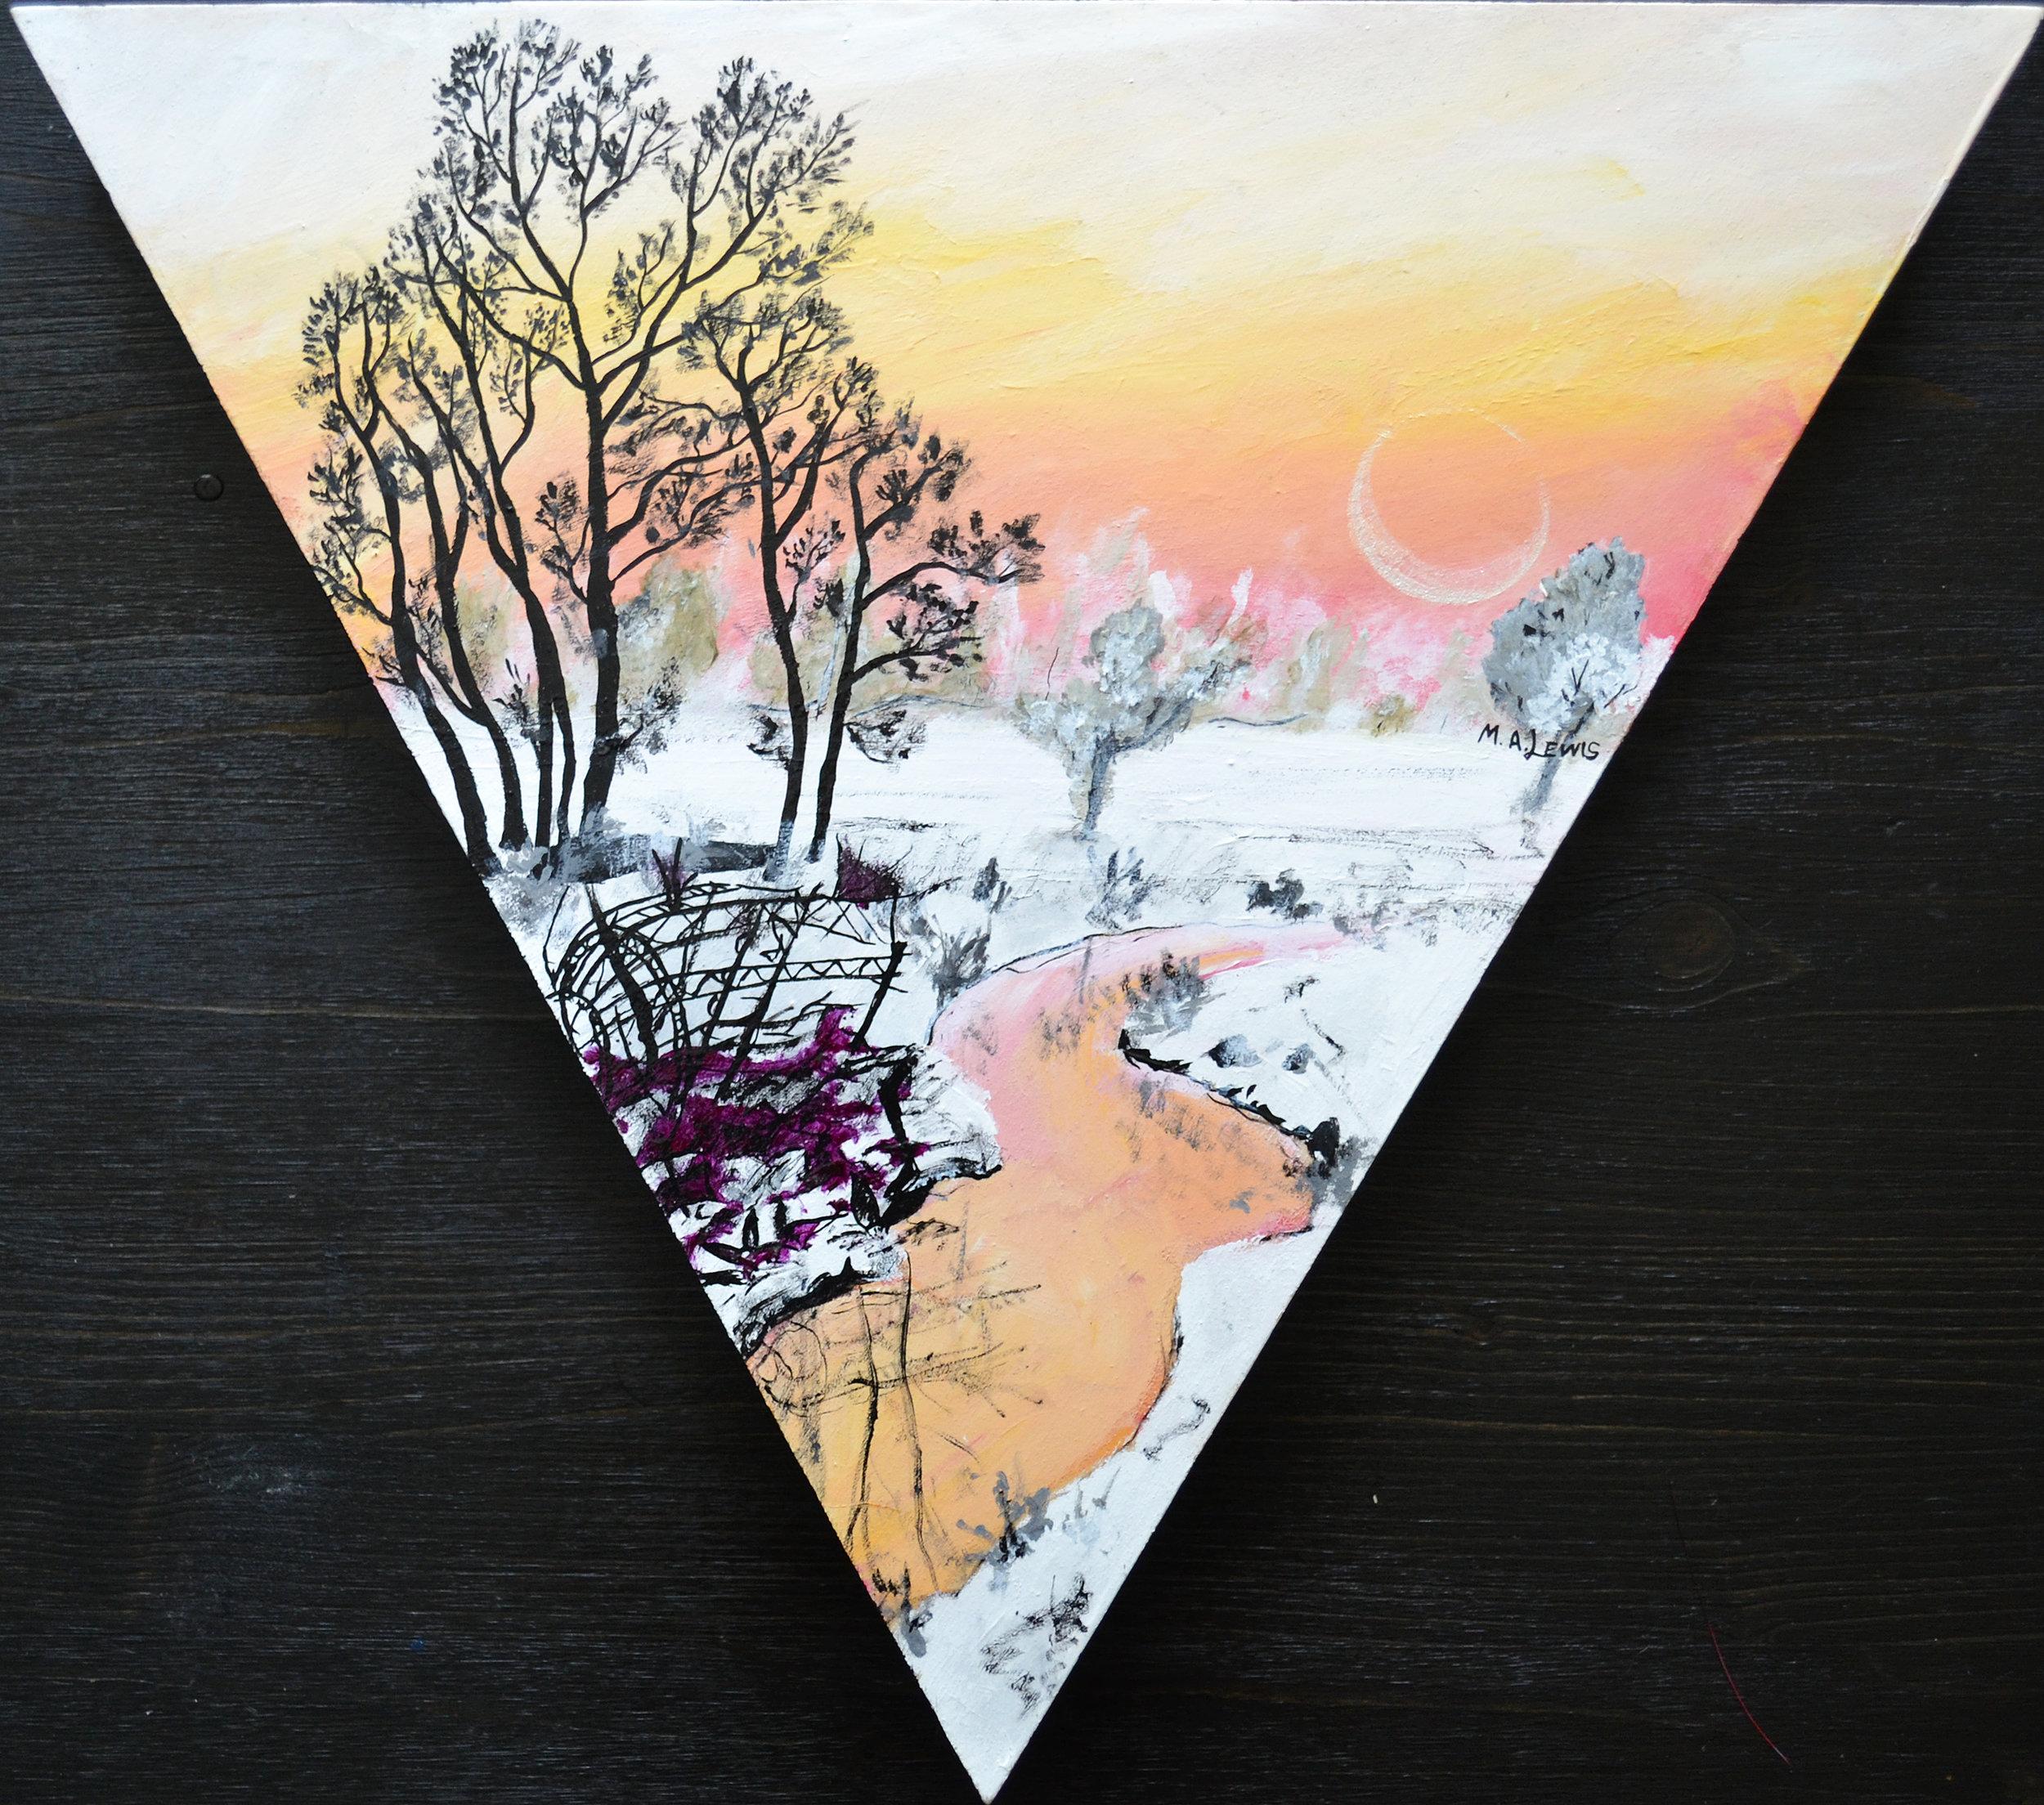 The Snow & The Fallen